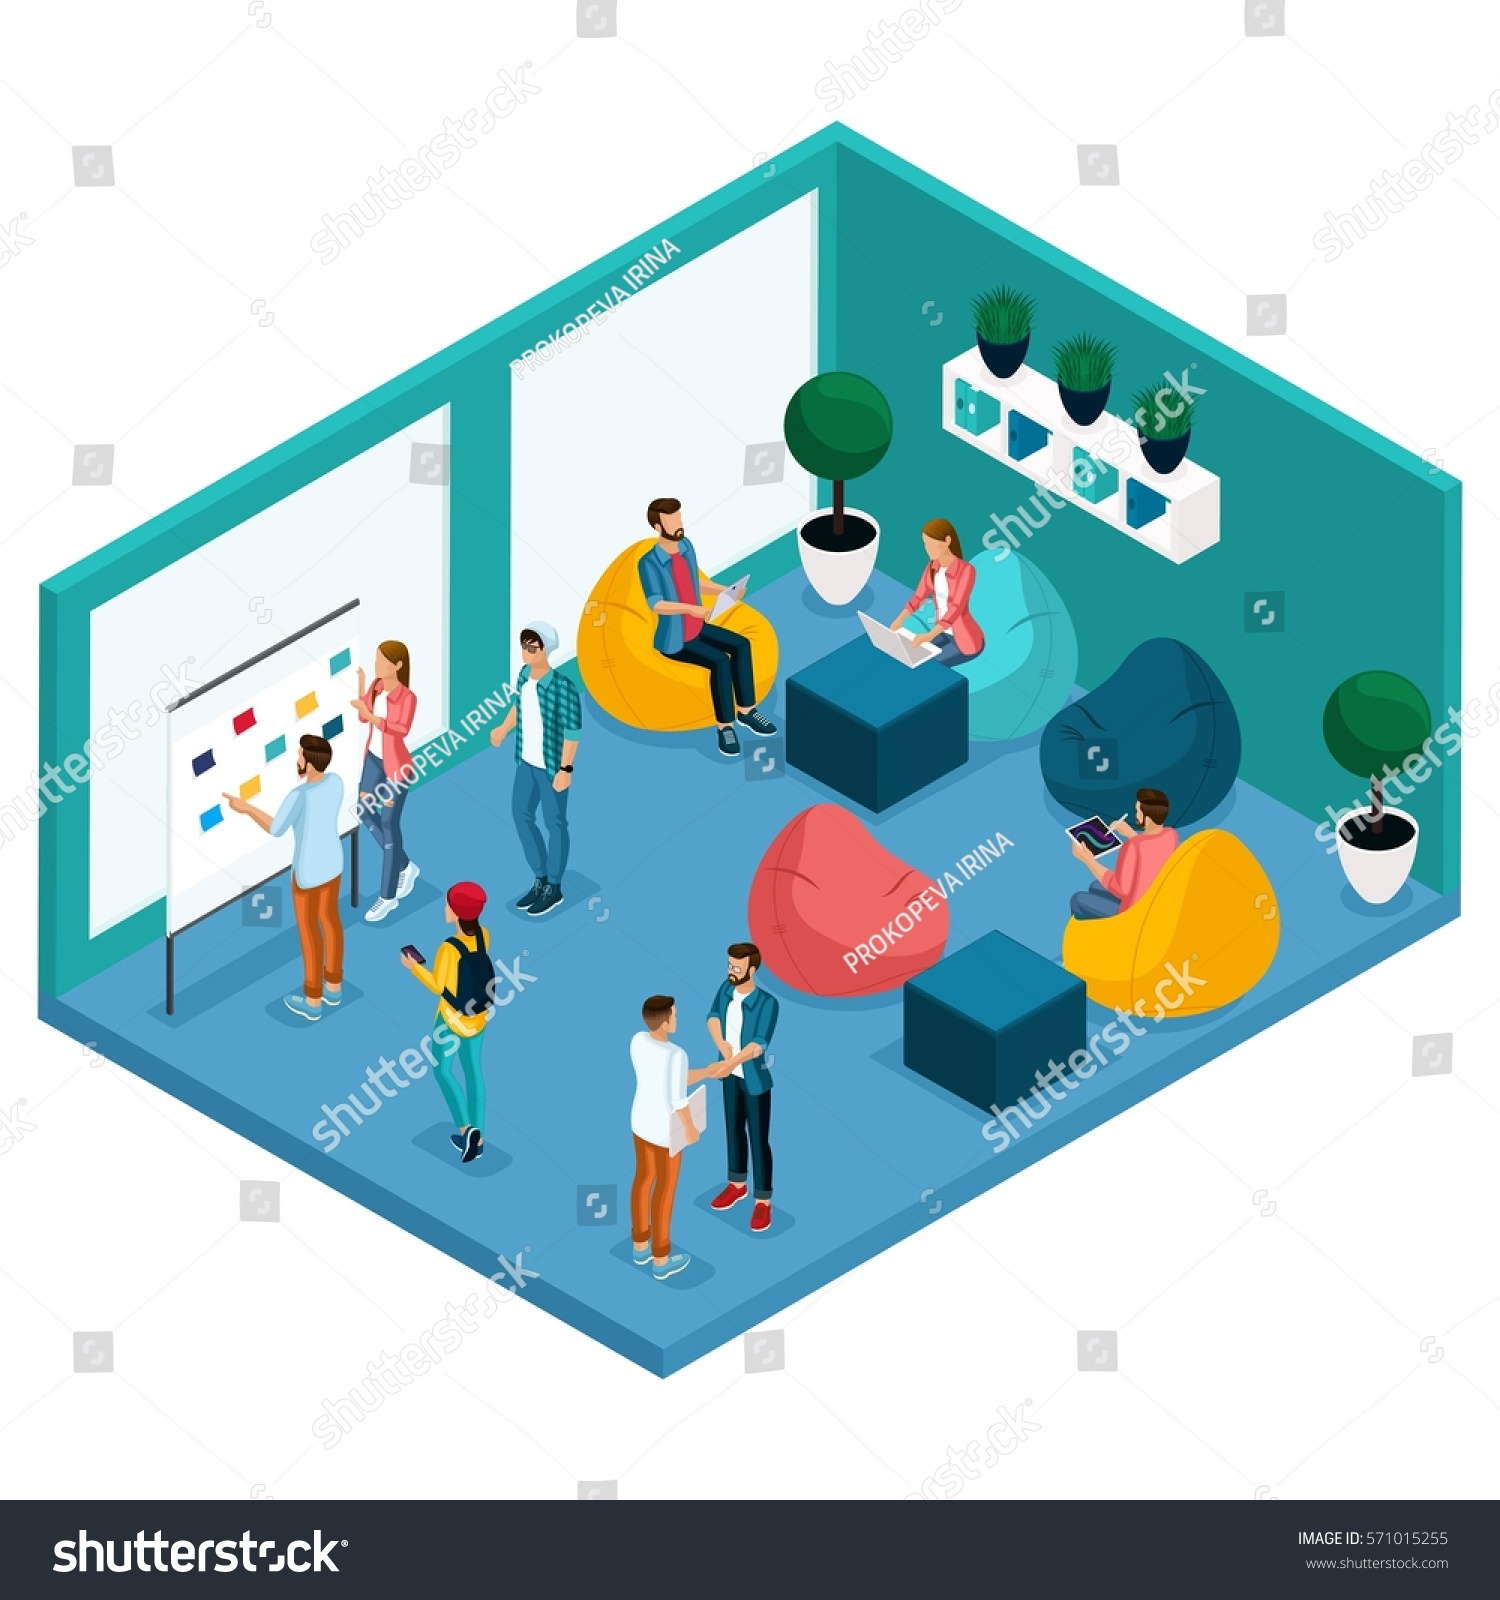 Trendy Isometric People Gadgets Room Coworking Stock